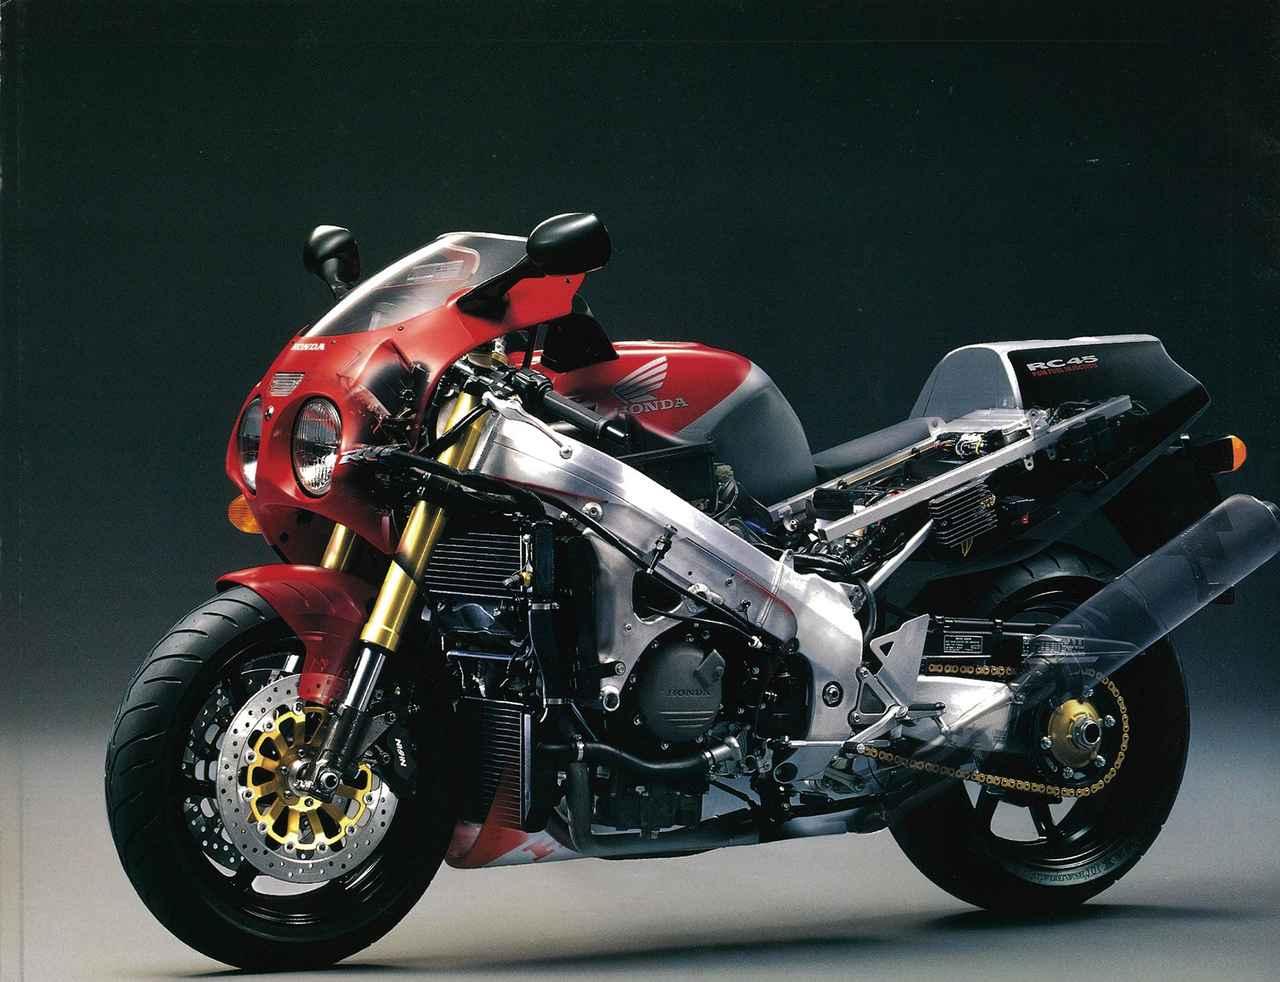 Images : 3番目の画像 - 「ワークスマシンの名を与えられた特別な1台!『HONDA RVF/RC45』【名車図鑑】」のアルバム - webオートバイ